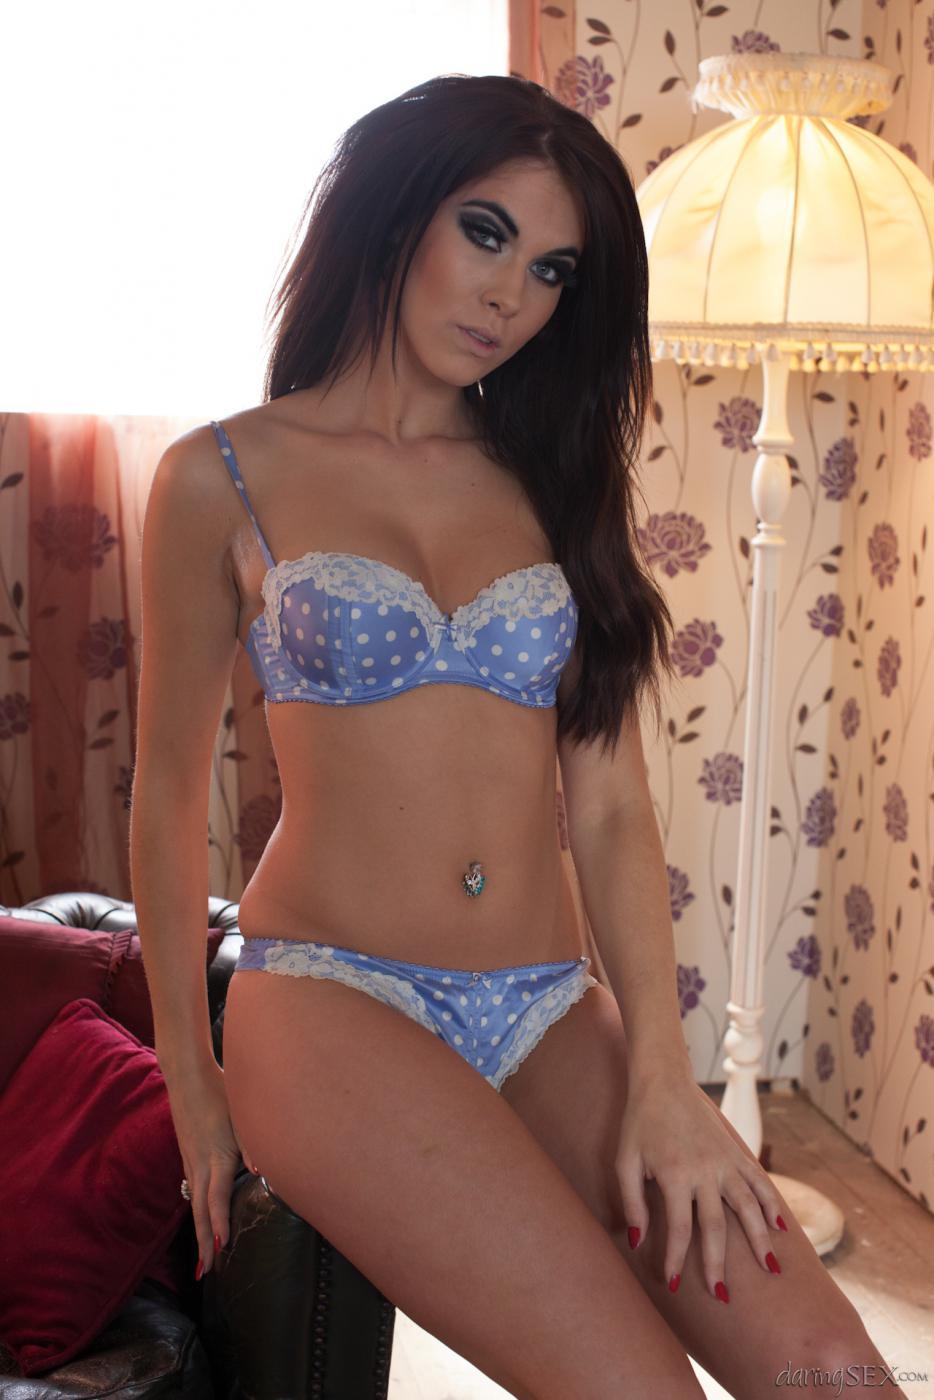 Megan Coxx in lingerie